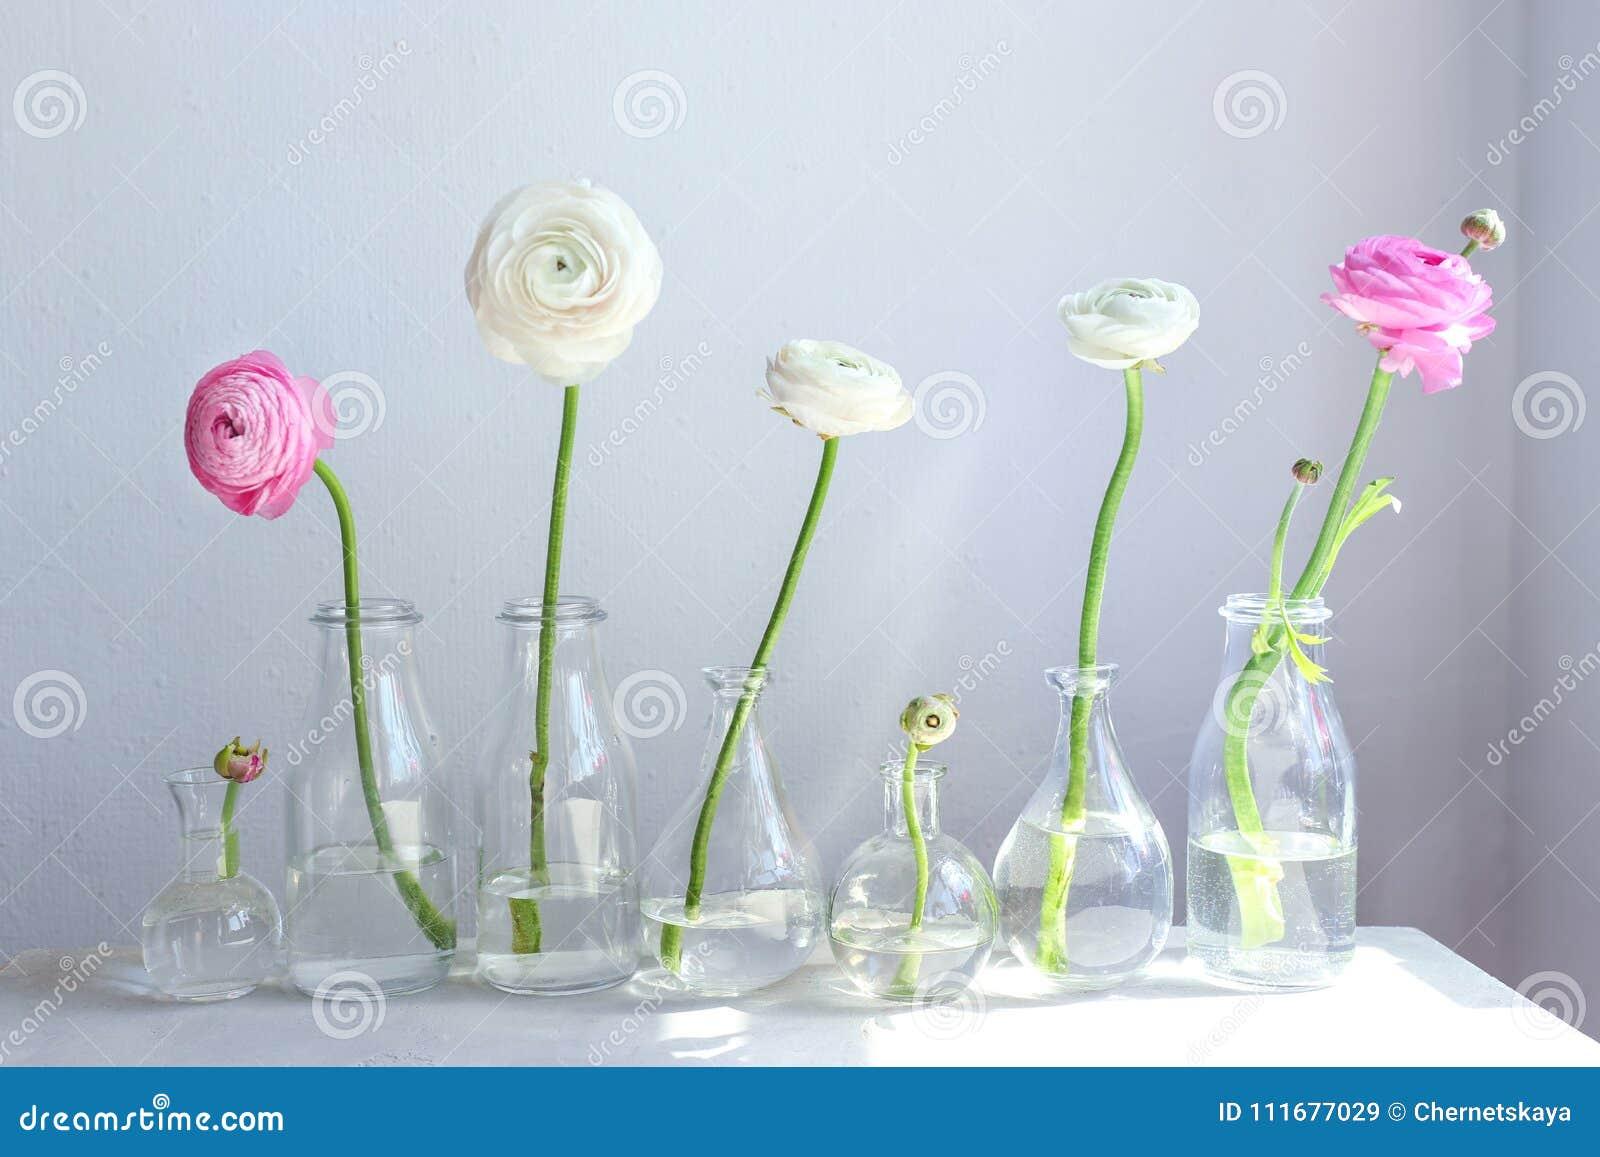 Glass vases with beautiful fresh ranunculus flowers stock image glass vases with beautiful fresh ranunculus flowers izmirmasajfo